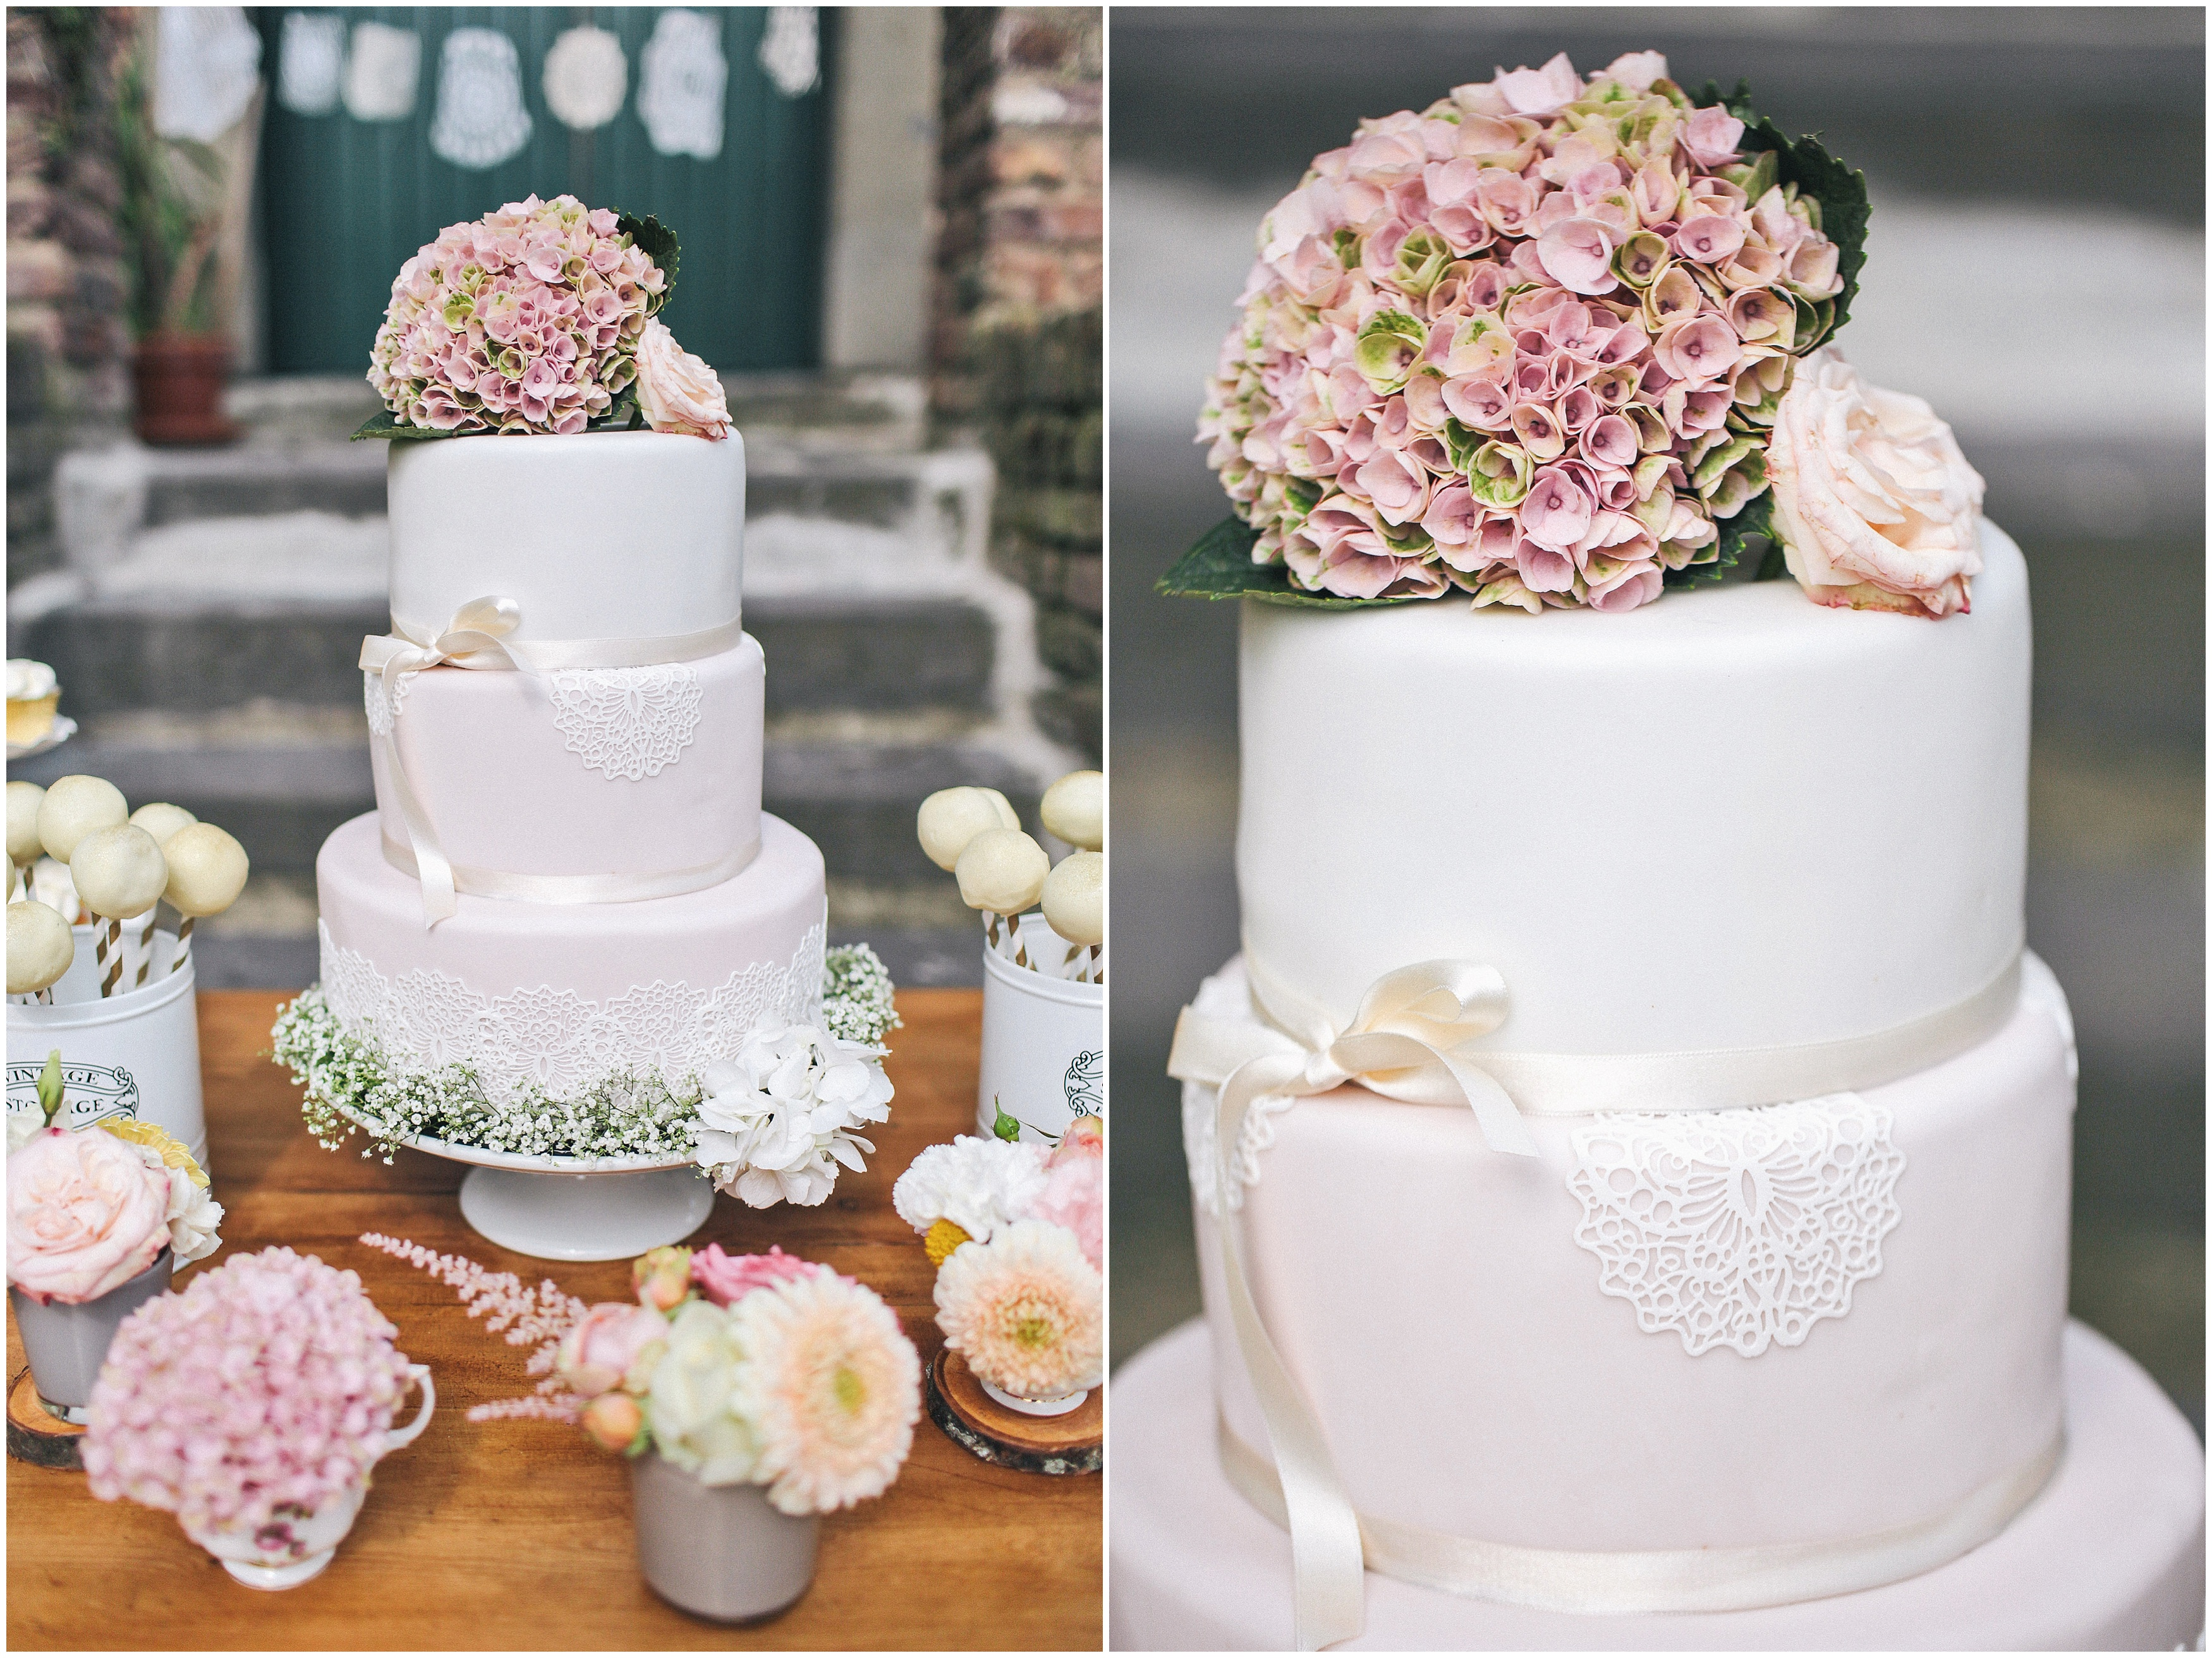 ivy&olive_Hochzeitsplanung_Nancy_Ebert_Fotografie_Vintage_Wedding_0027